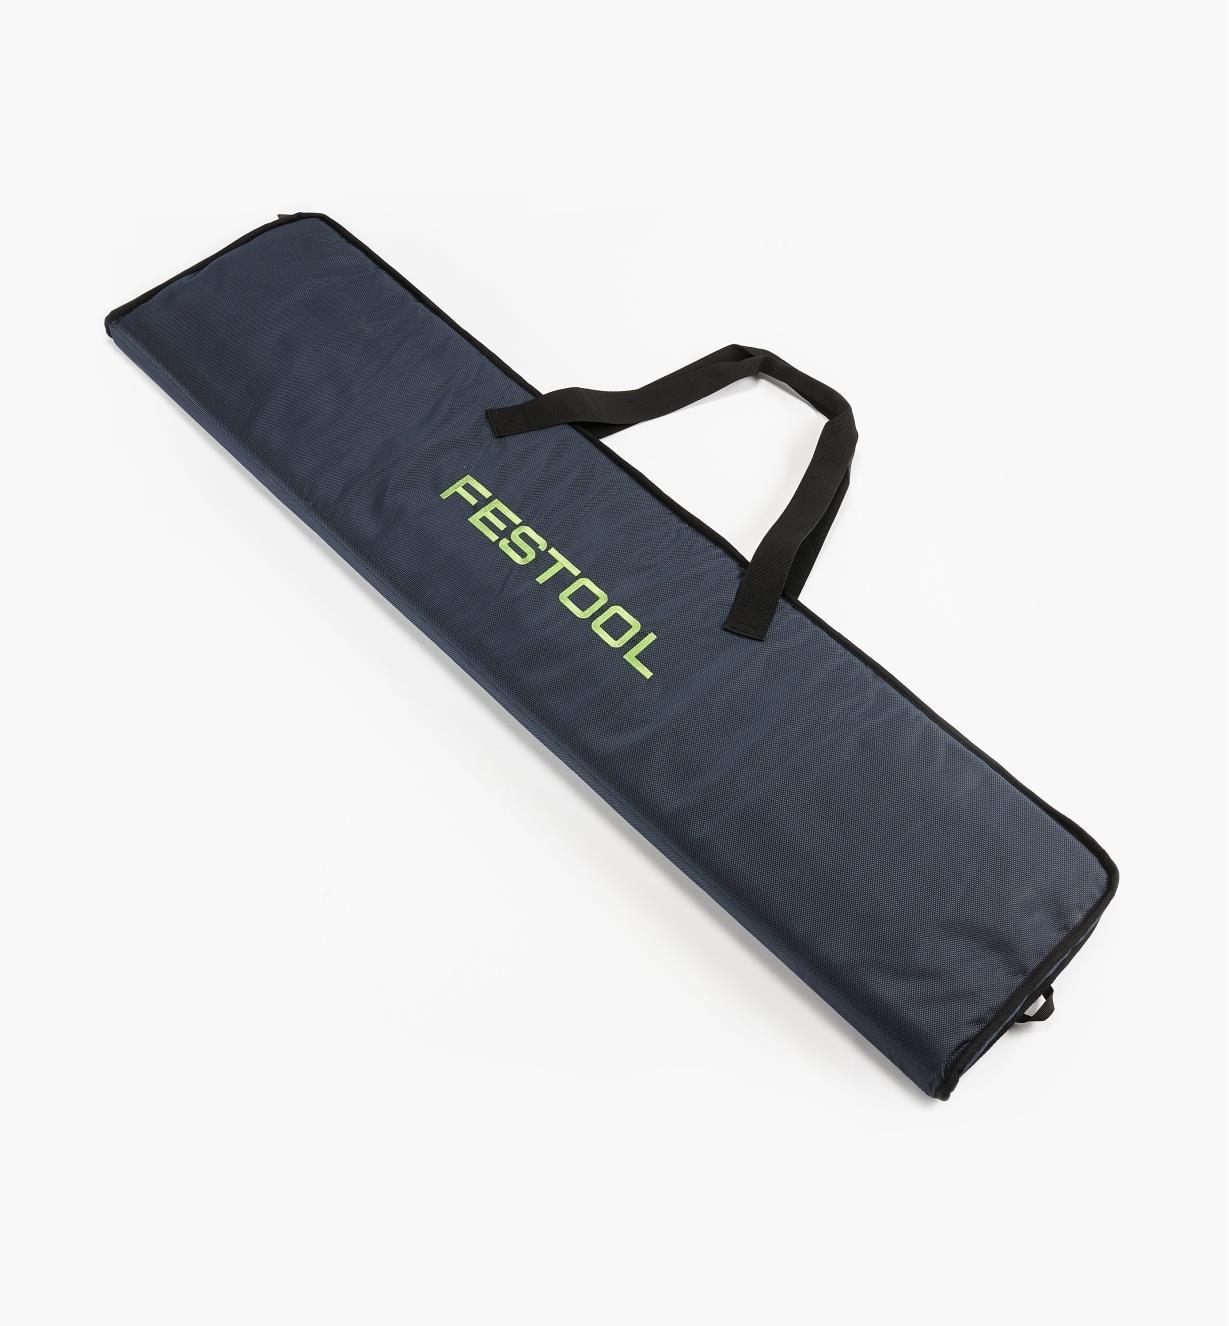 ZA200161 - Guide Rail Tote Bag FSK 670